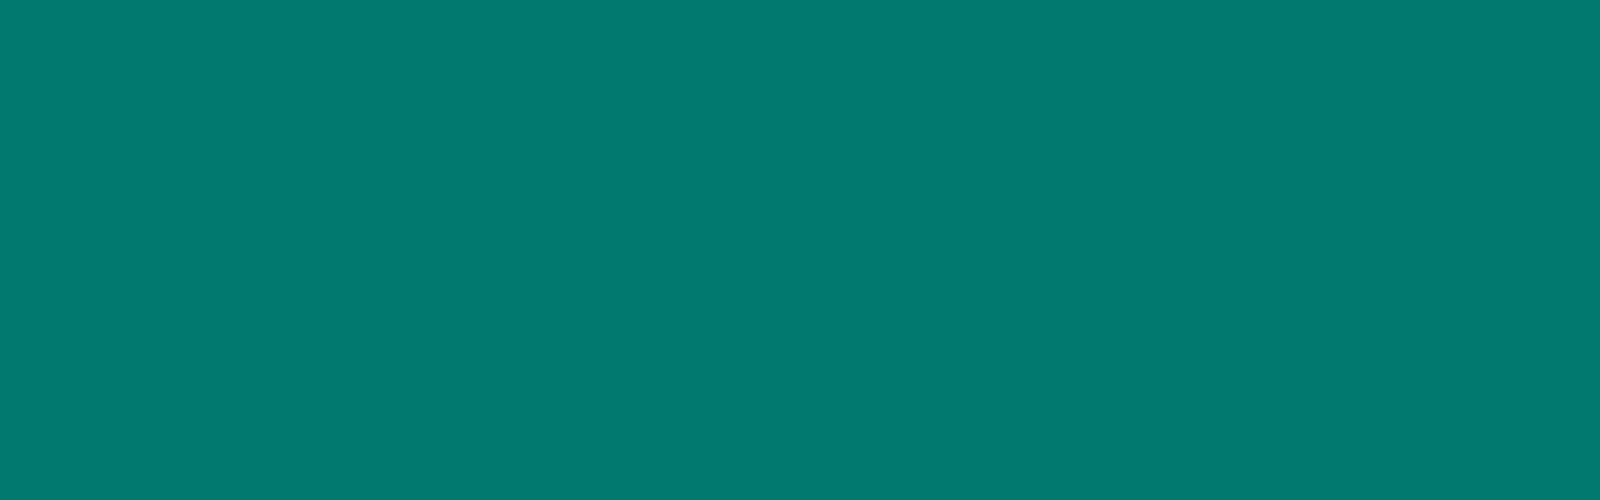 Background image header - Colors